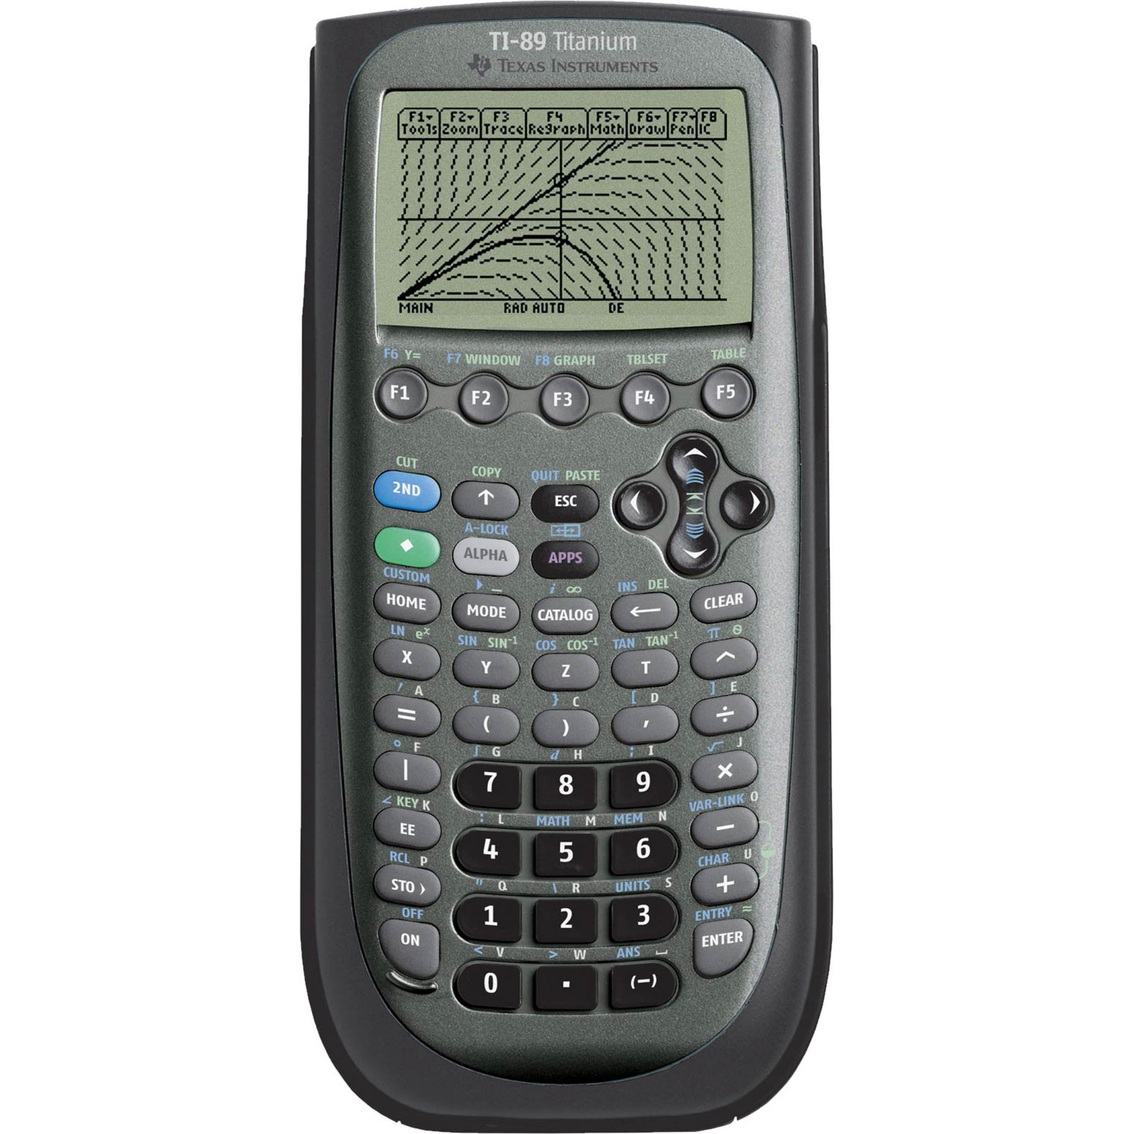 texas instruments ti 89 titanium graphing calculator tools rh shopmyexchange com ti 89 manual free download ti 89 manual download